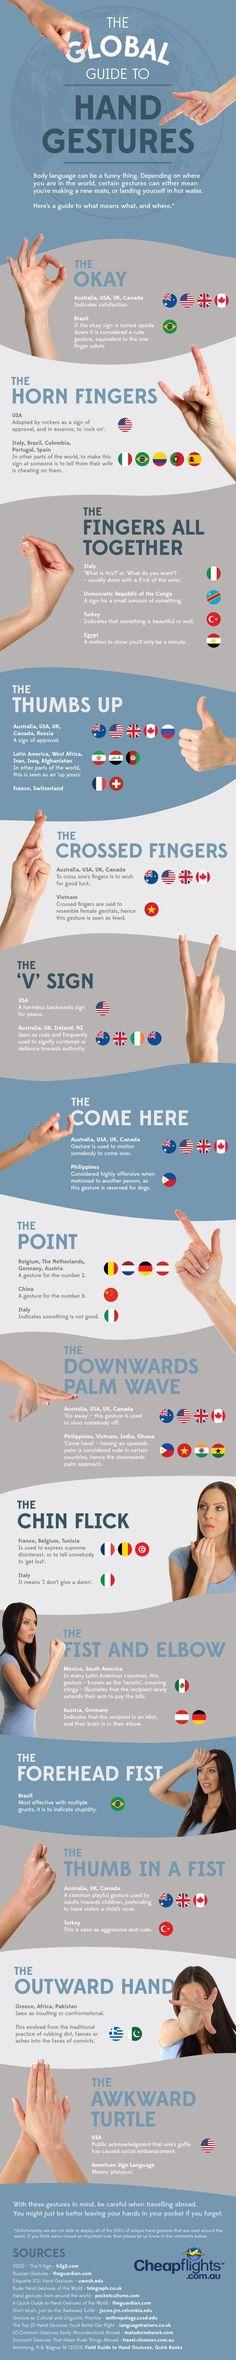 Infographic: The Global Guide to Hand Gestures http://www.huffingtonpost.com/2014/03/17/the-global-guide-to-hand-_n_4956860.html?ncid=fcbklnkushpmg00000063